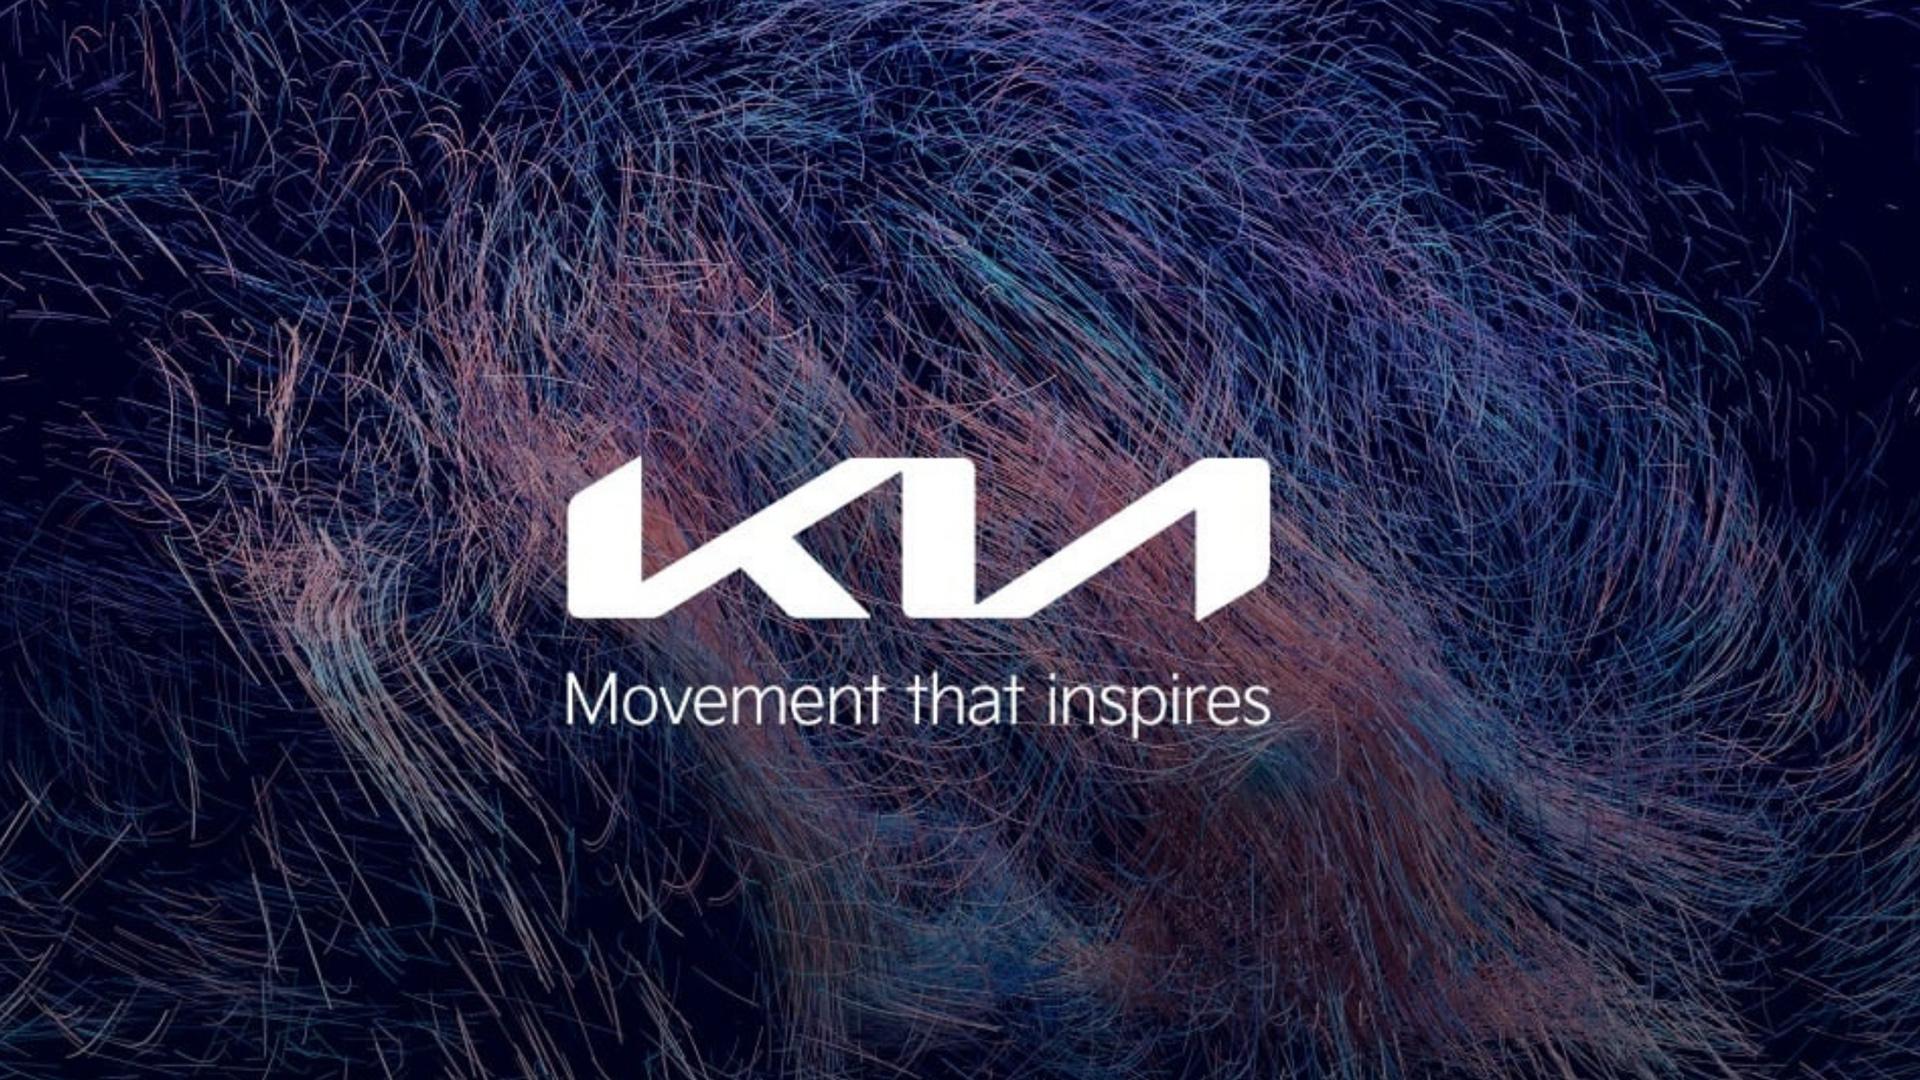 KIA se renueva: MOVEMENT THAT INSPIRES